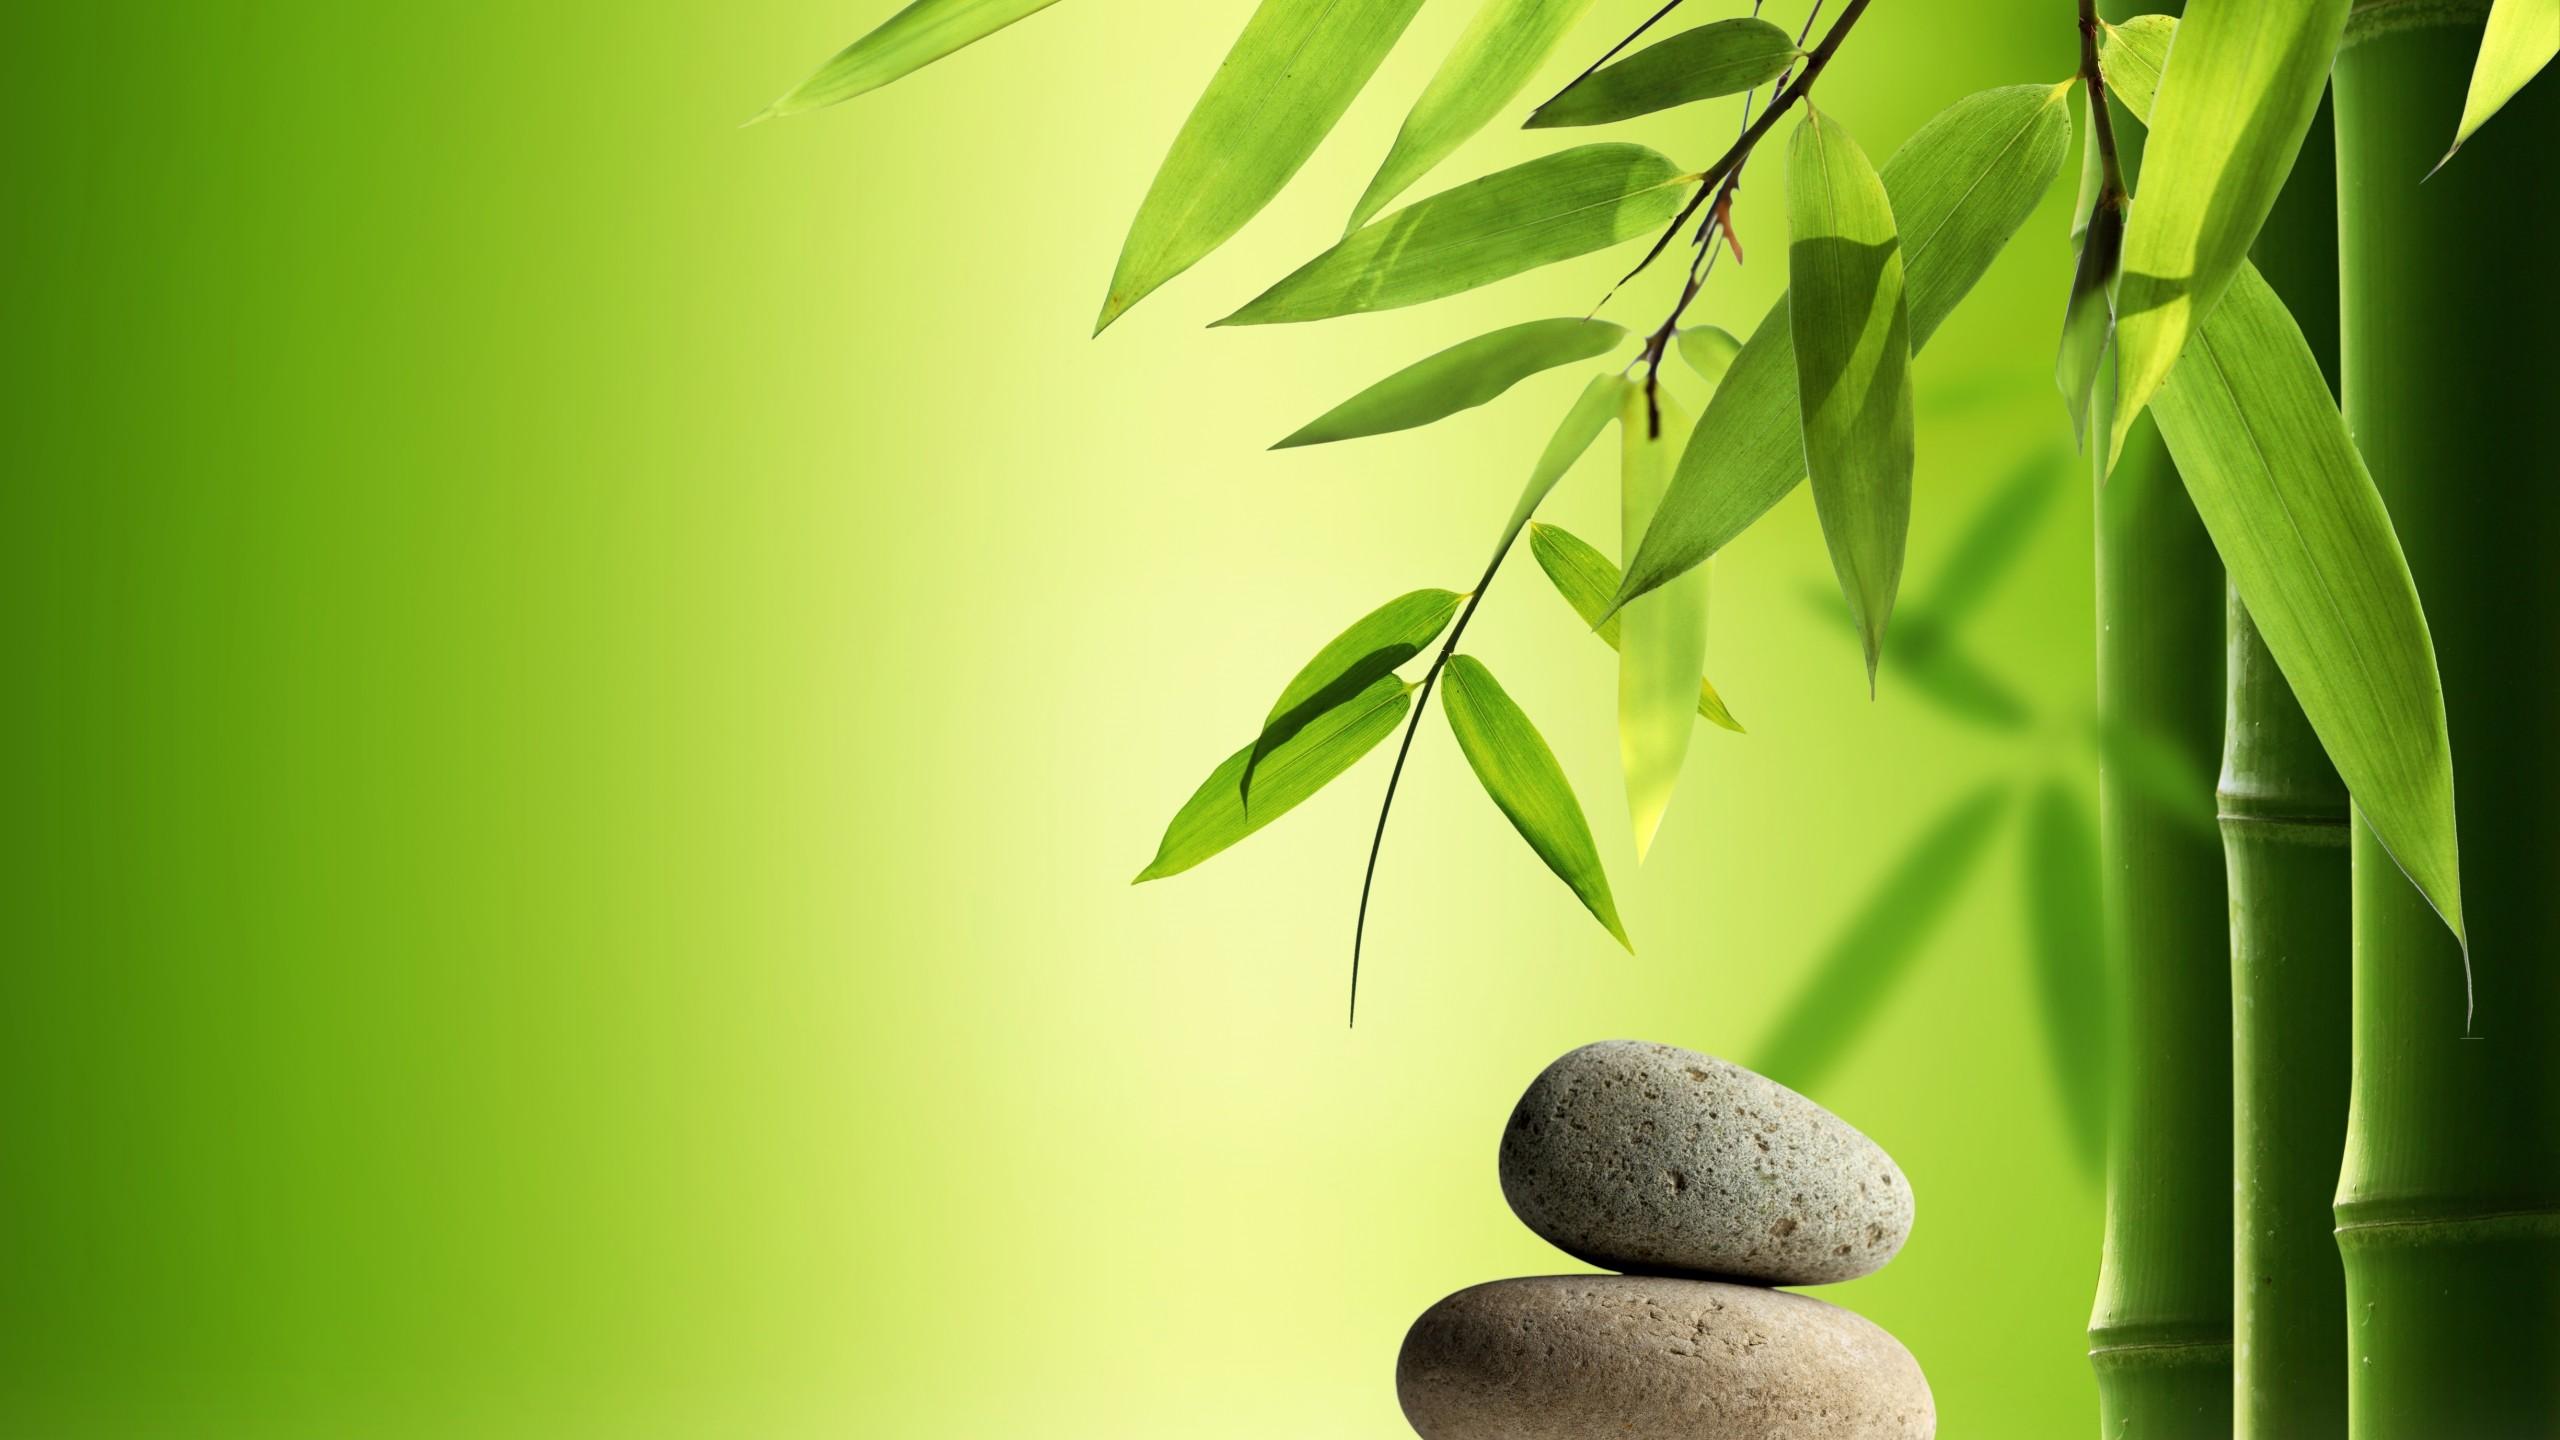 Spa Wallpaper zen stones bamboo water 2560x1440   HD Wallpapers 2560x1440